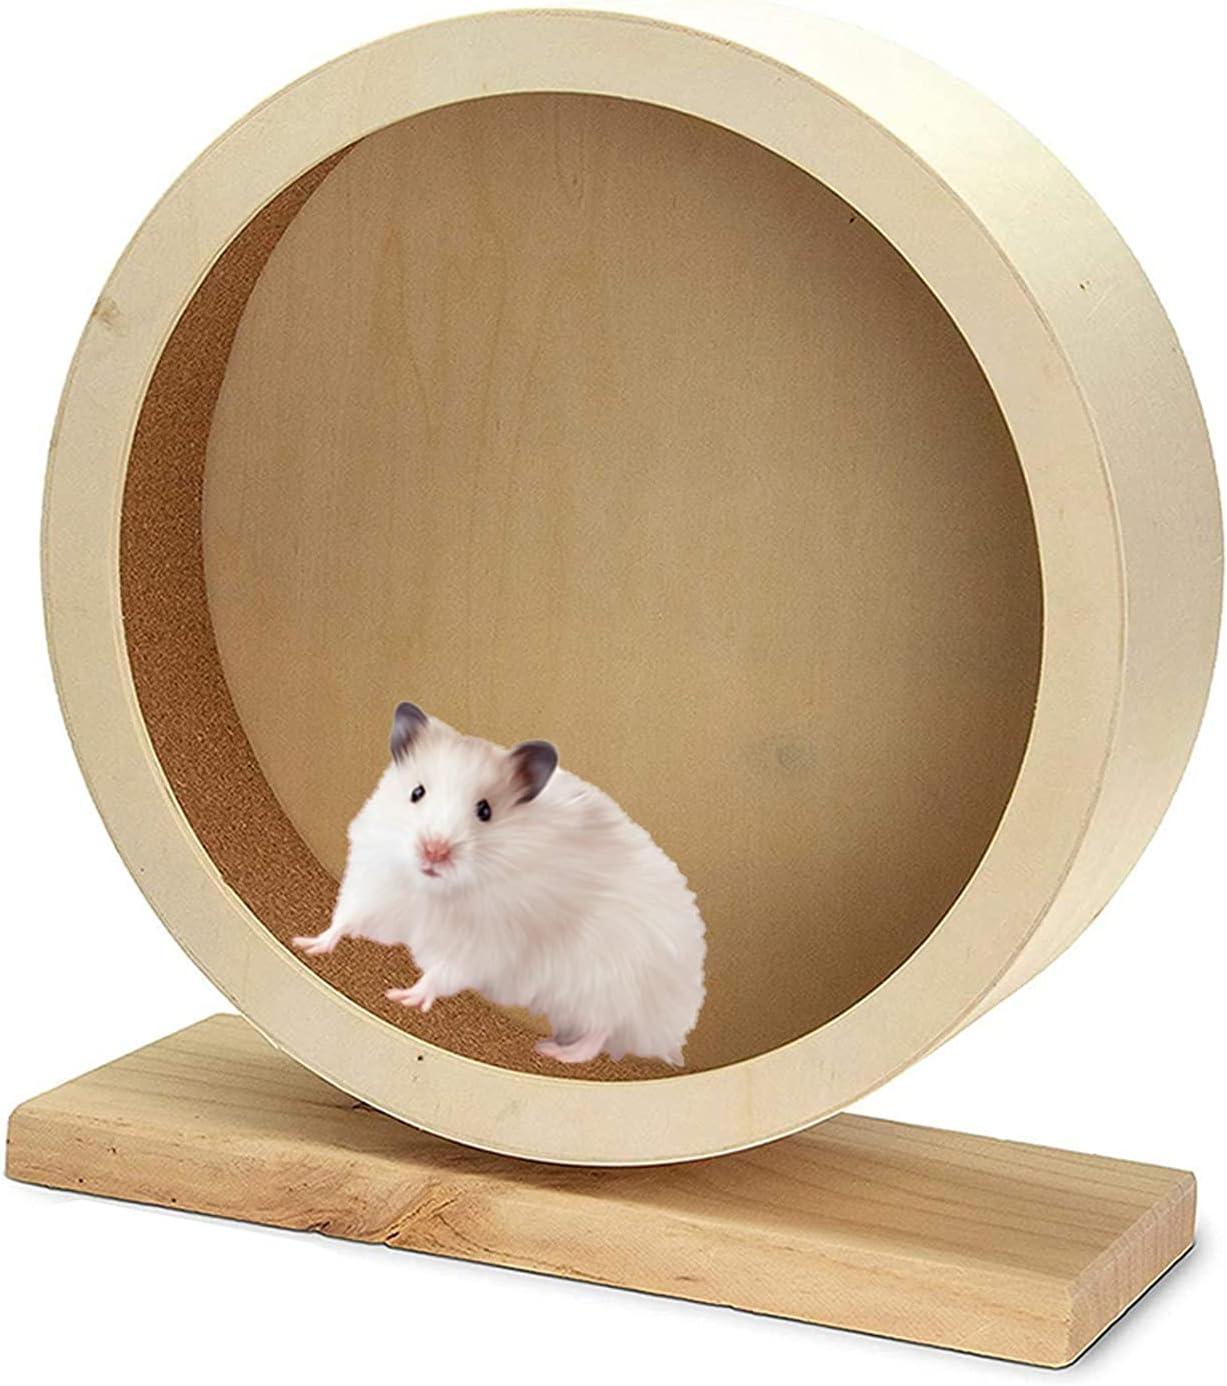 Hamster Under blast sales Wooden Memphis Mall Wheel Silent Toy 6.8 Running in N